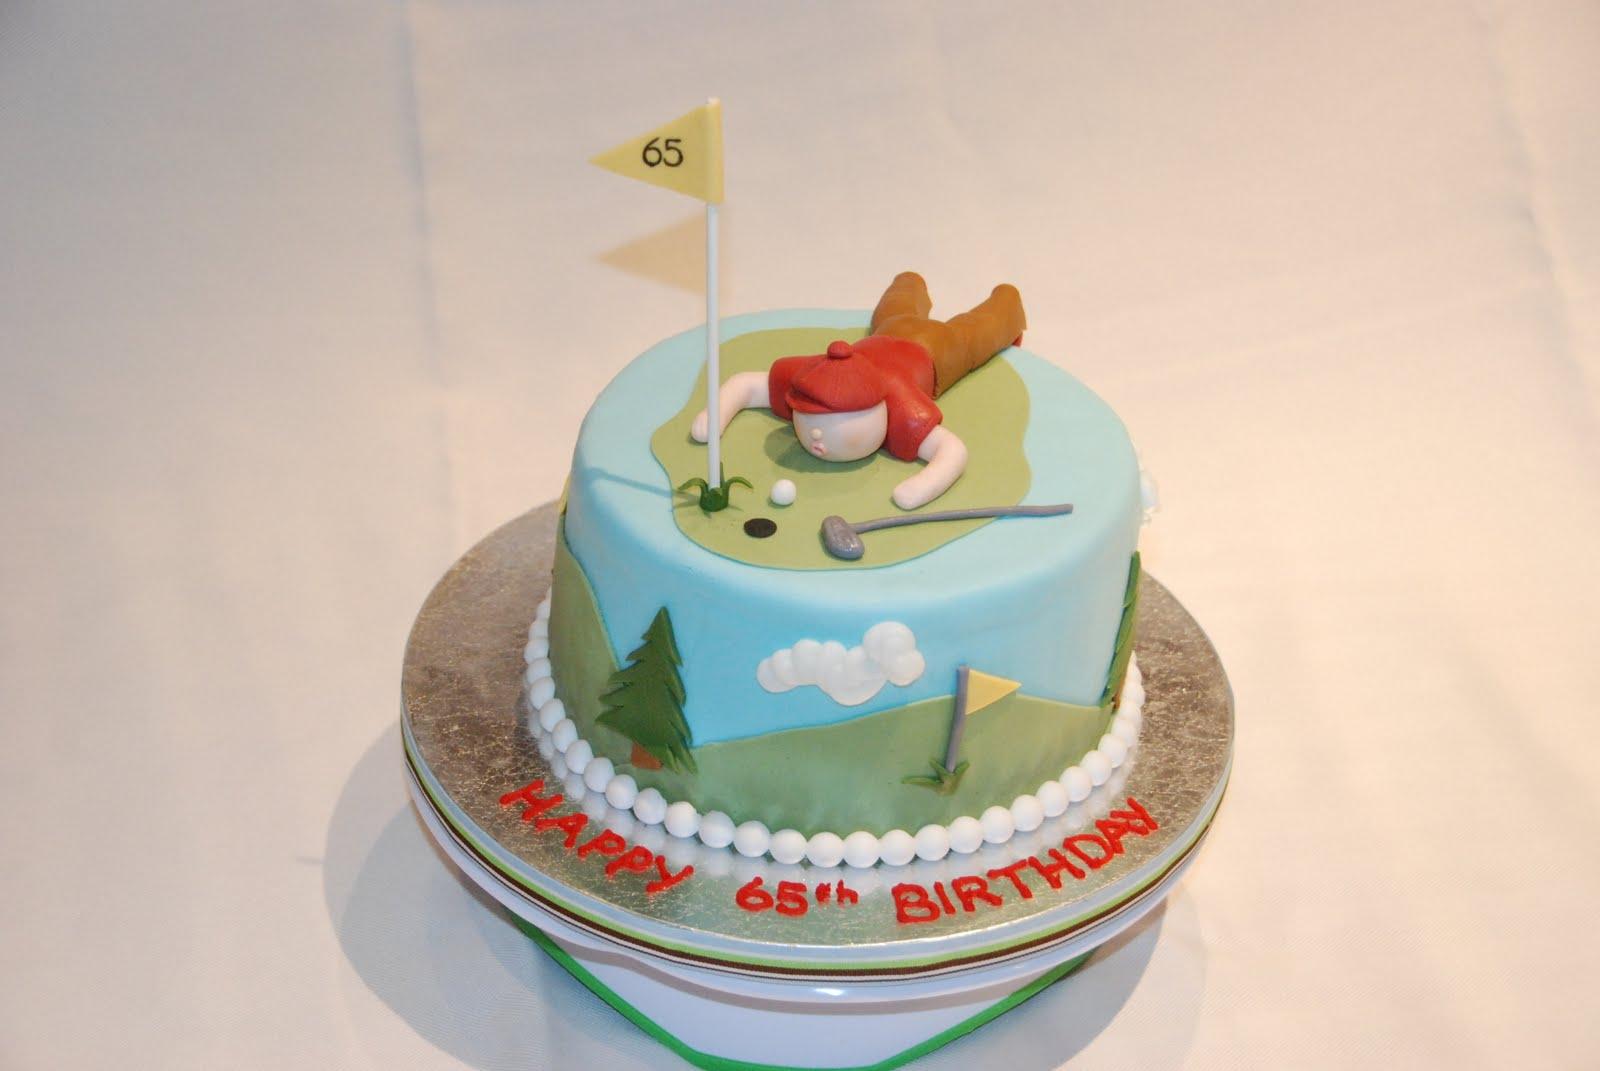 Cake Creations by Trish Golf themed 65th Birthday